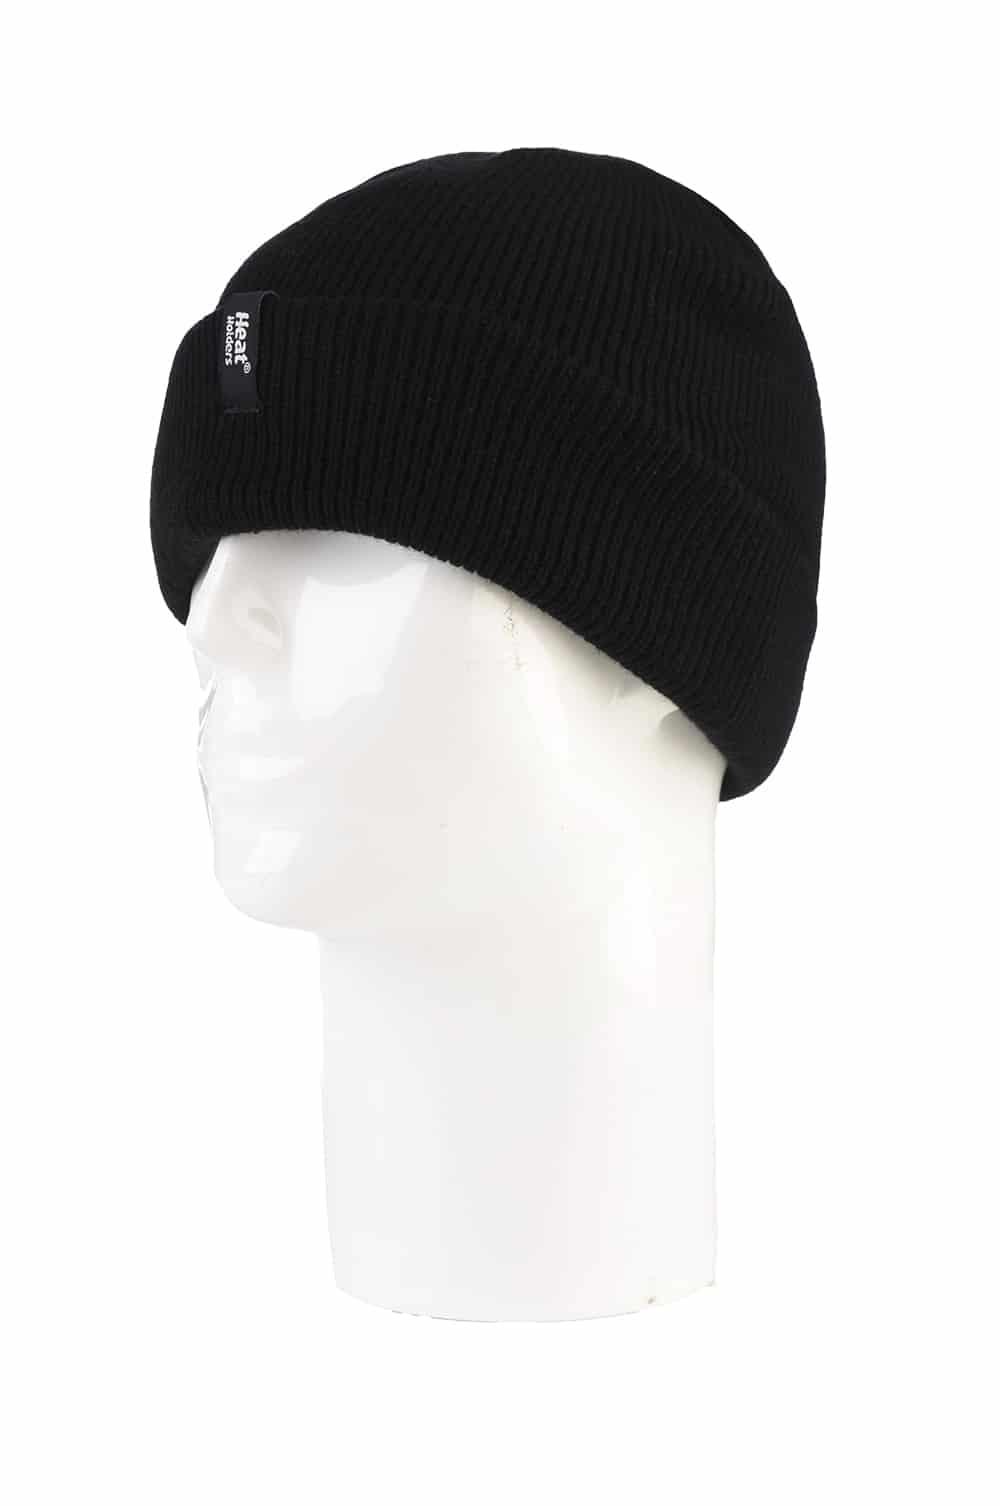 Men's Heat Holders Black Winter Fleece Lined Turnover Cuff Thermal Hat